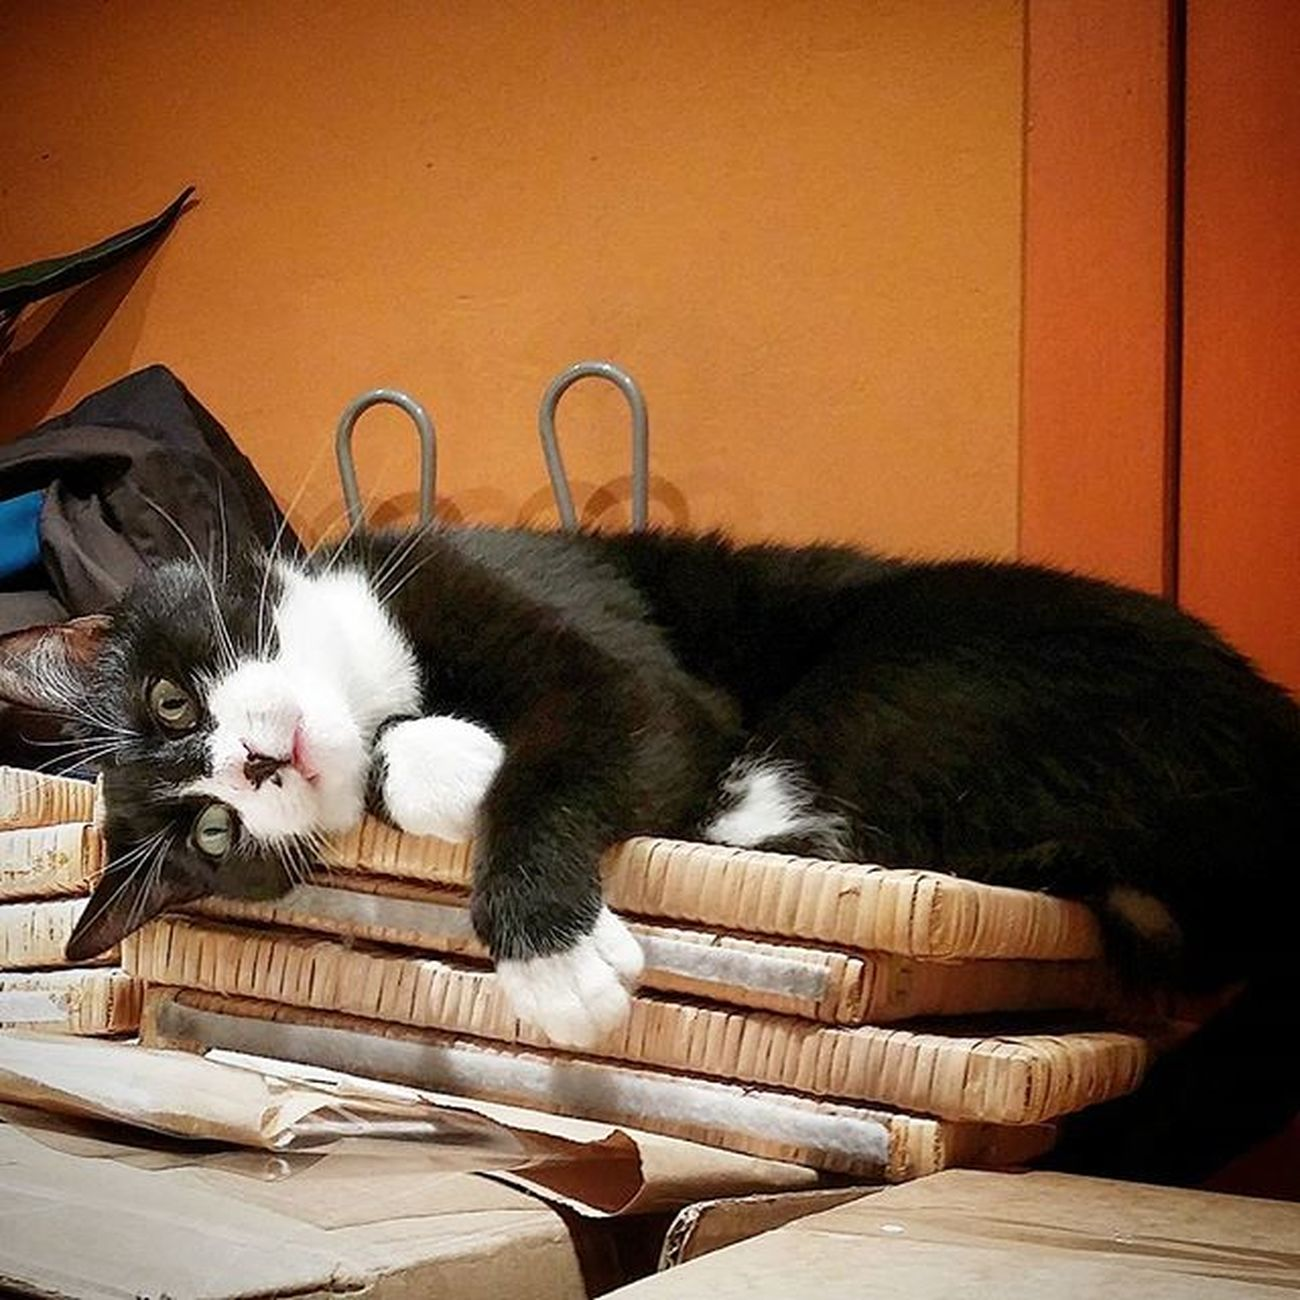 Relax Turin Sanslavario Ig_cats Instacats Photographer Photooftheday Picoftheday Animalphotography Sguardo  Dolcezza Amareigatti Catsgram Catsofinstagram Buongiornotorino Momentidolci